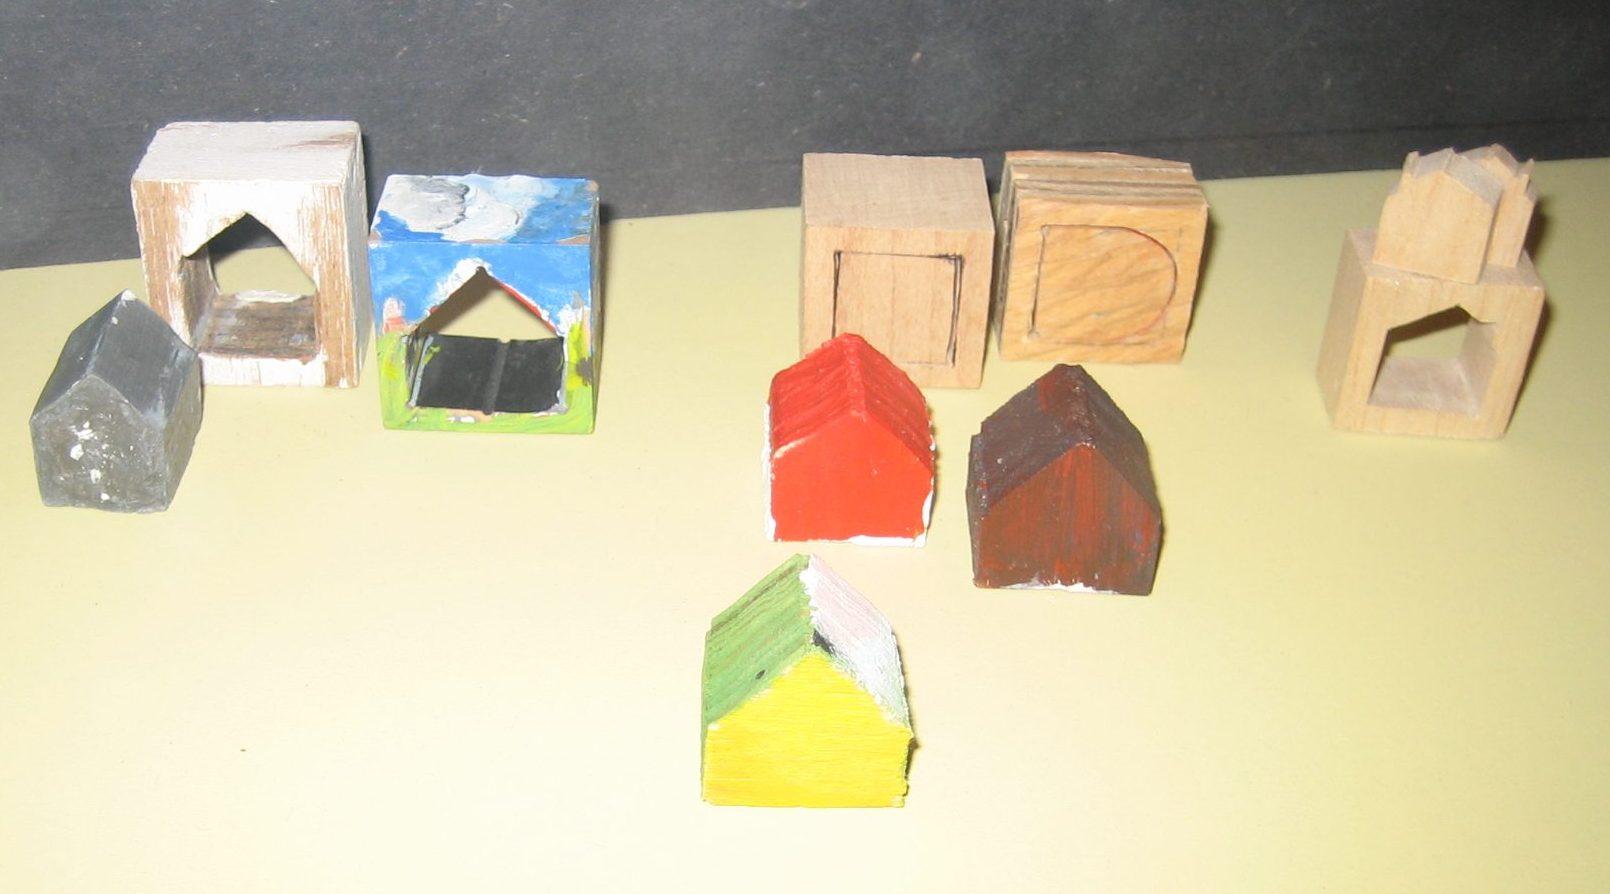 Werk in uitvoering, CODA, 2010, hout, verf, ringen, tentoonstelling